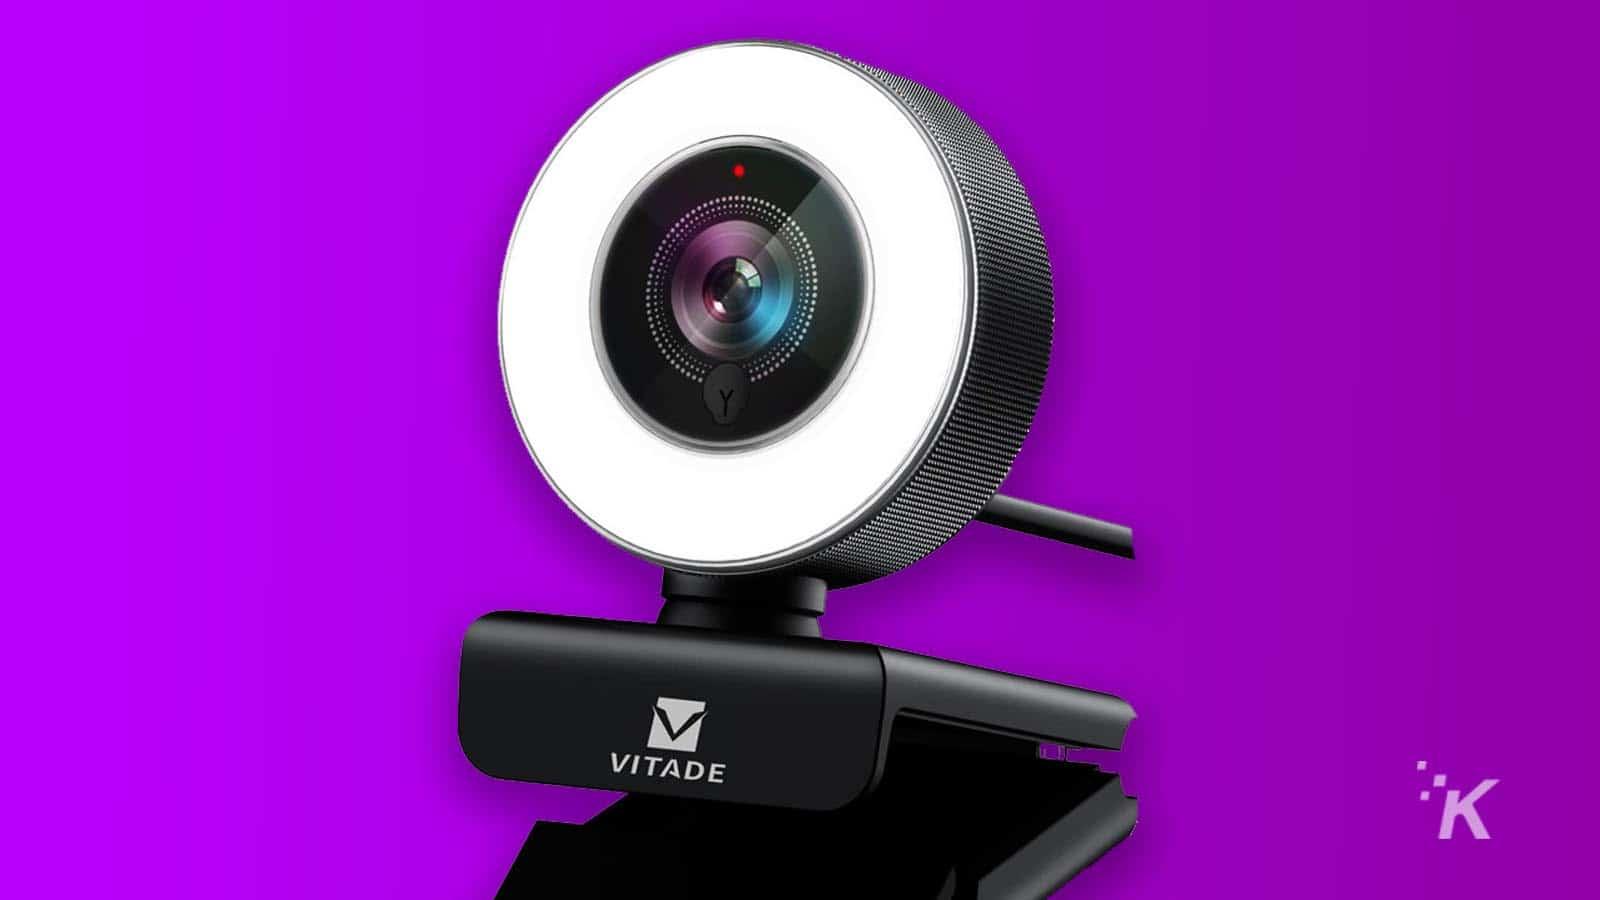 vitade pc webcam